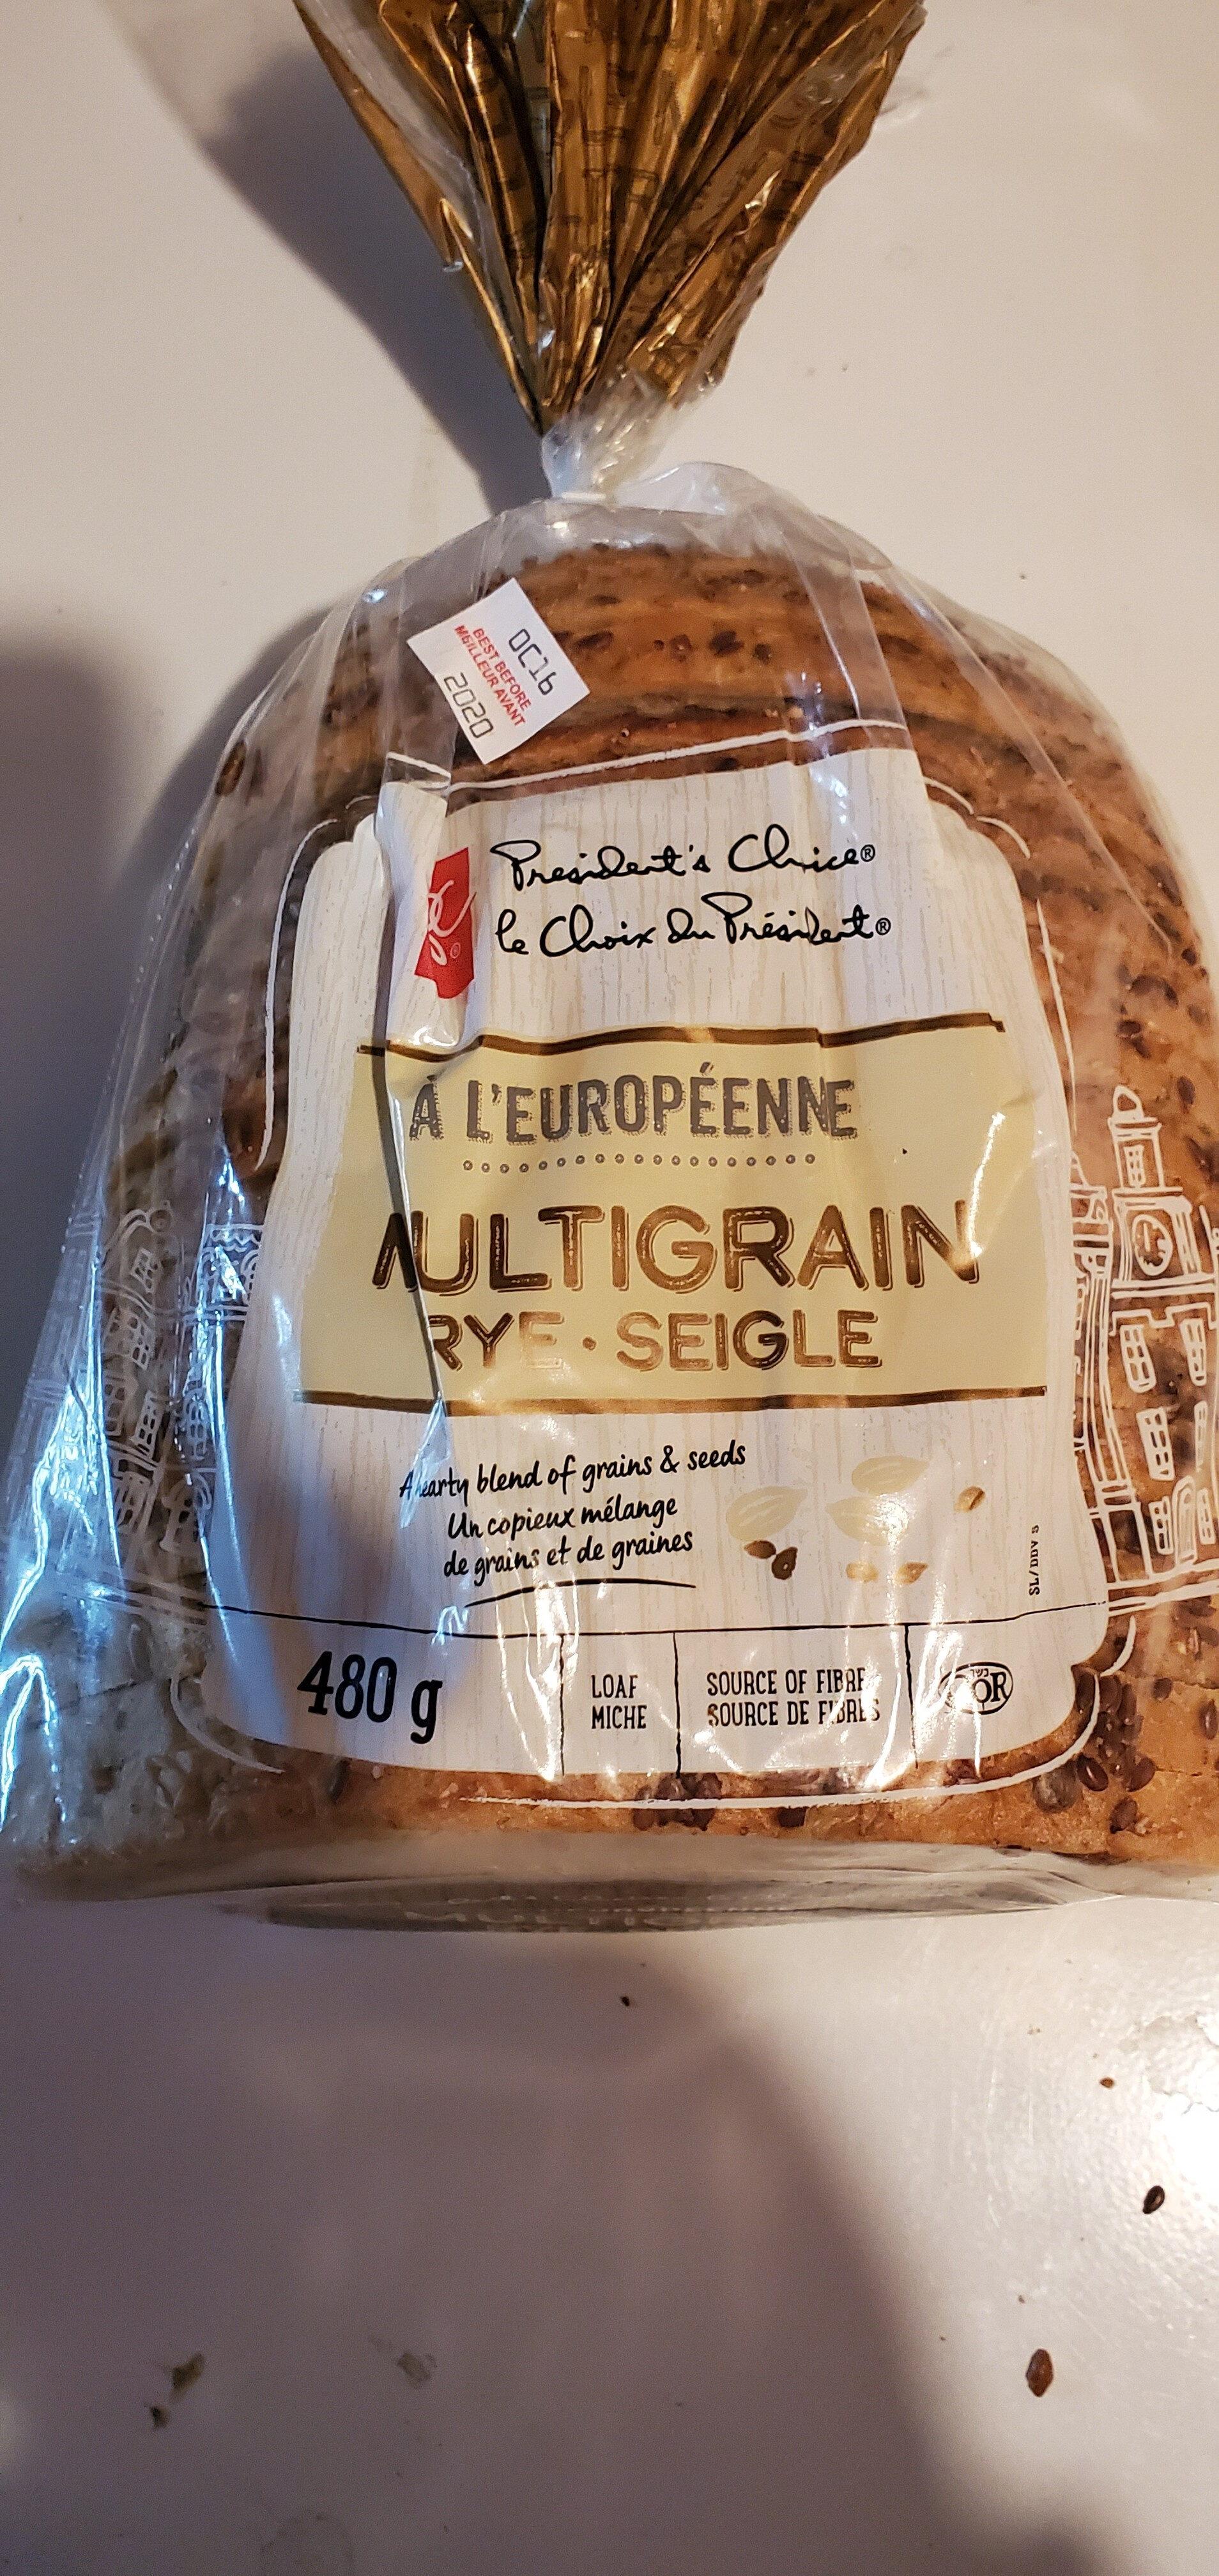 À l'européenne multigrain rye loaf - Ingredients - en